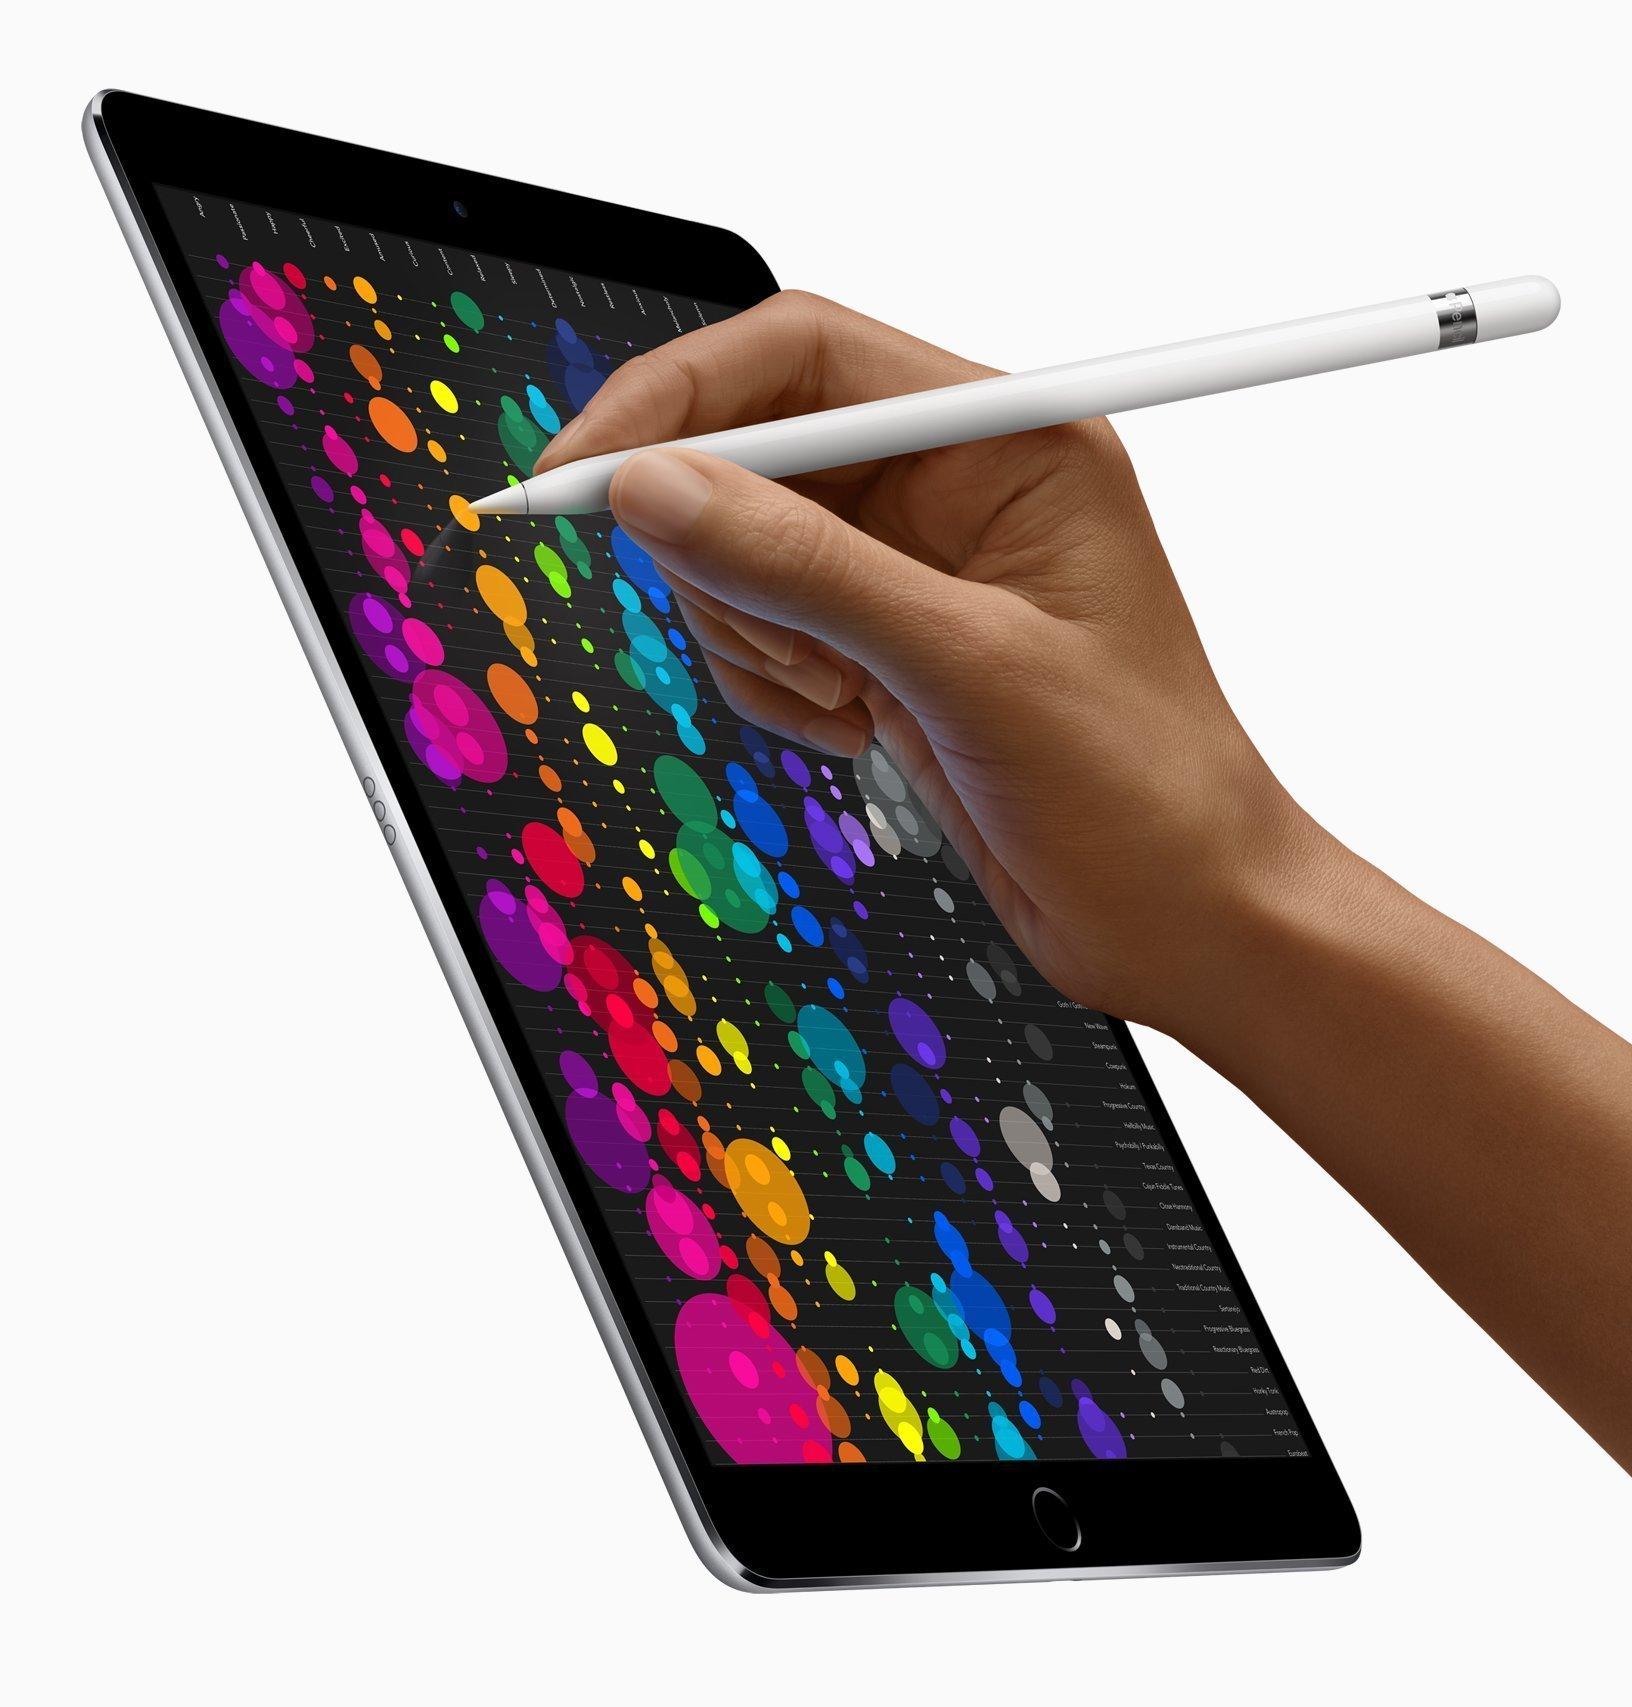 iPad Pro WWDC 2017